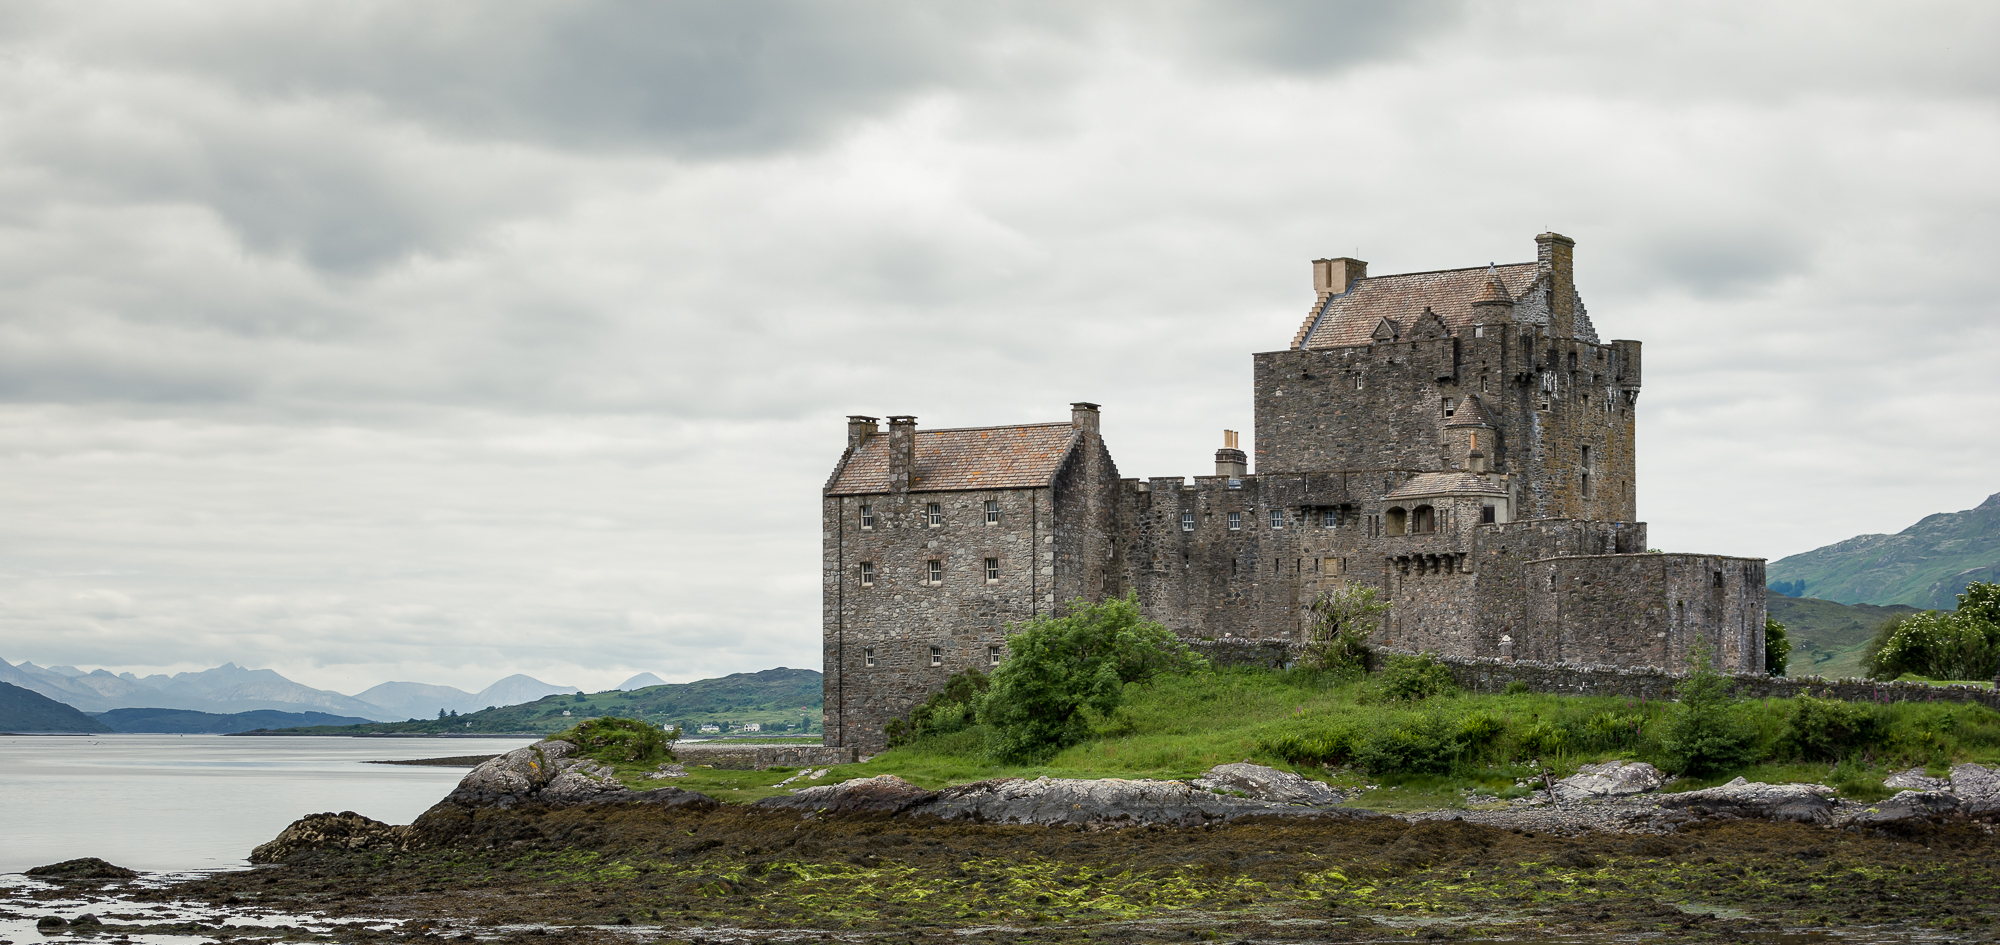 Eilean Donan Castle - Scotland, 2014